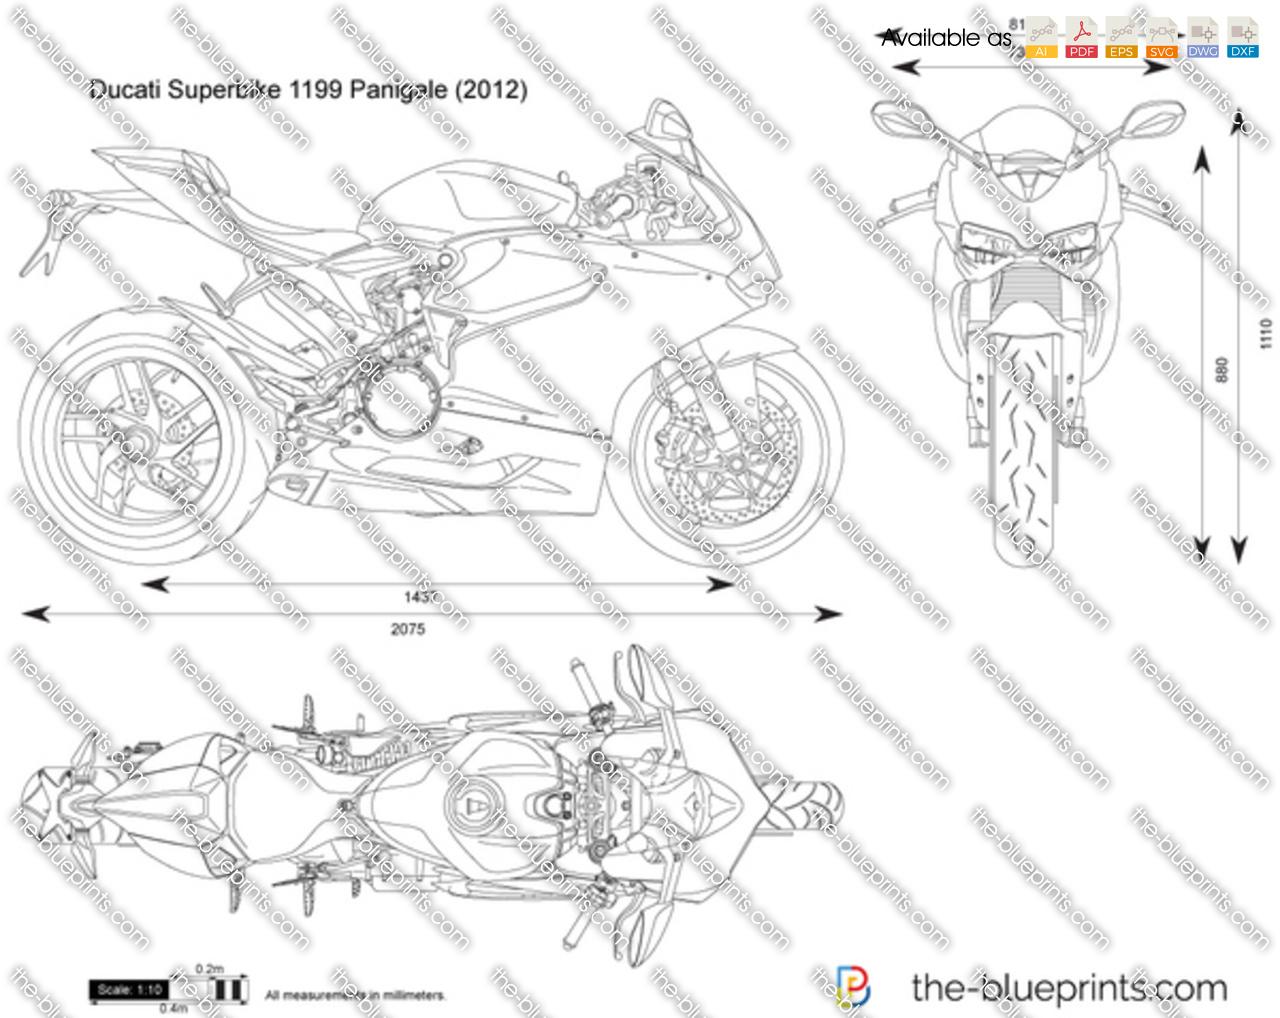 Ducati Superbike Panigale